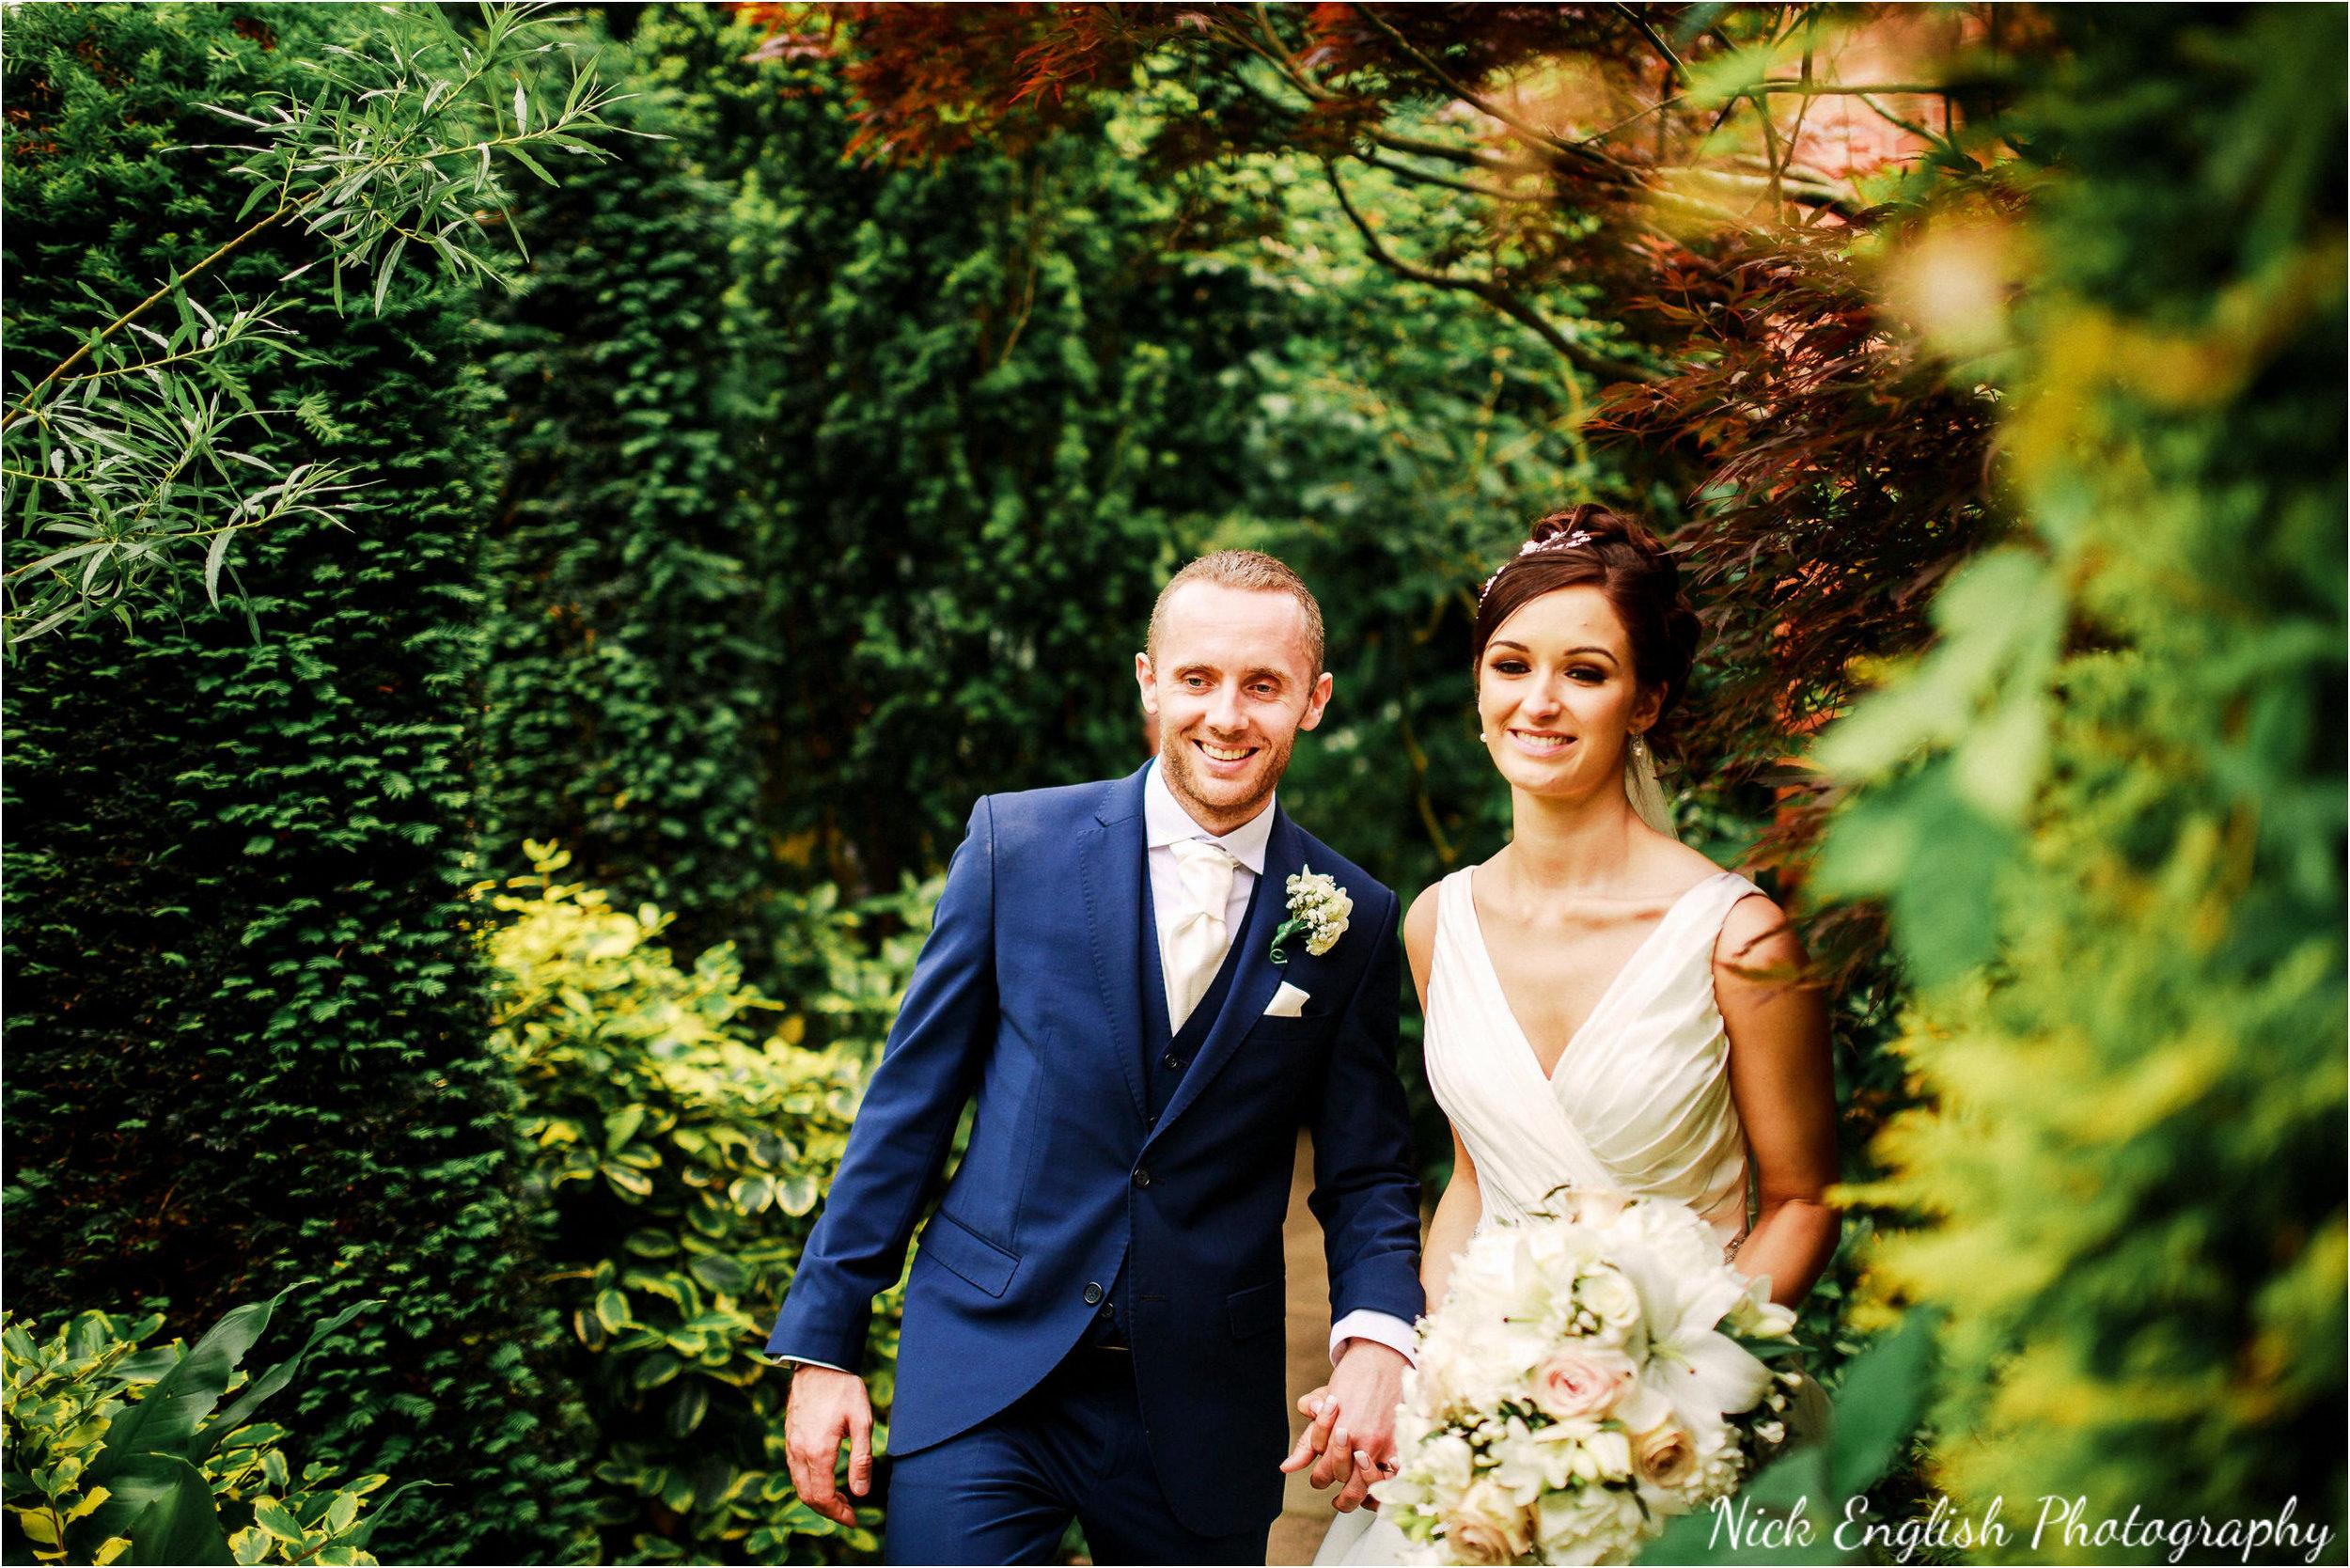 Emily David Wedding Photographs at Barton Grange Preston by Nick English Photography 145jpg.jpeg